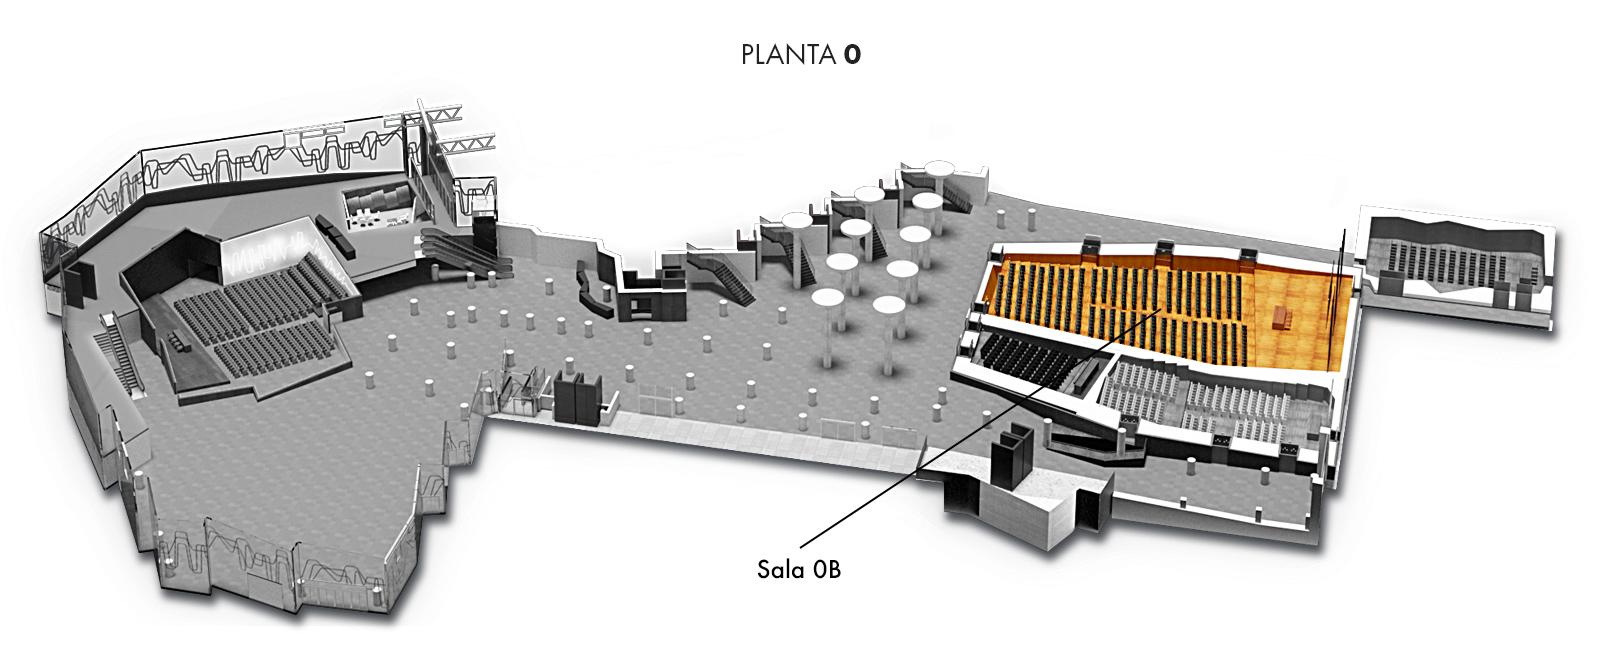 Sala 0B, Planta 0   Palacio Euskalduna Jauregia